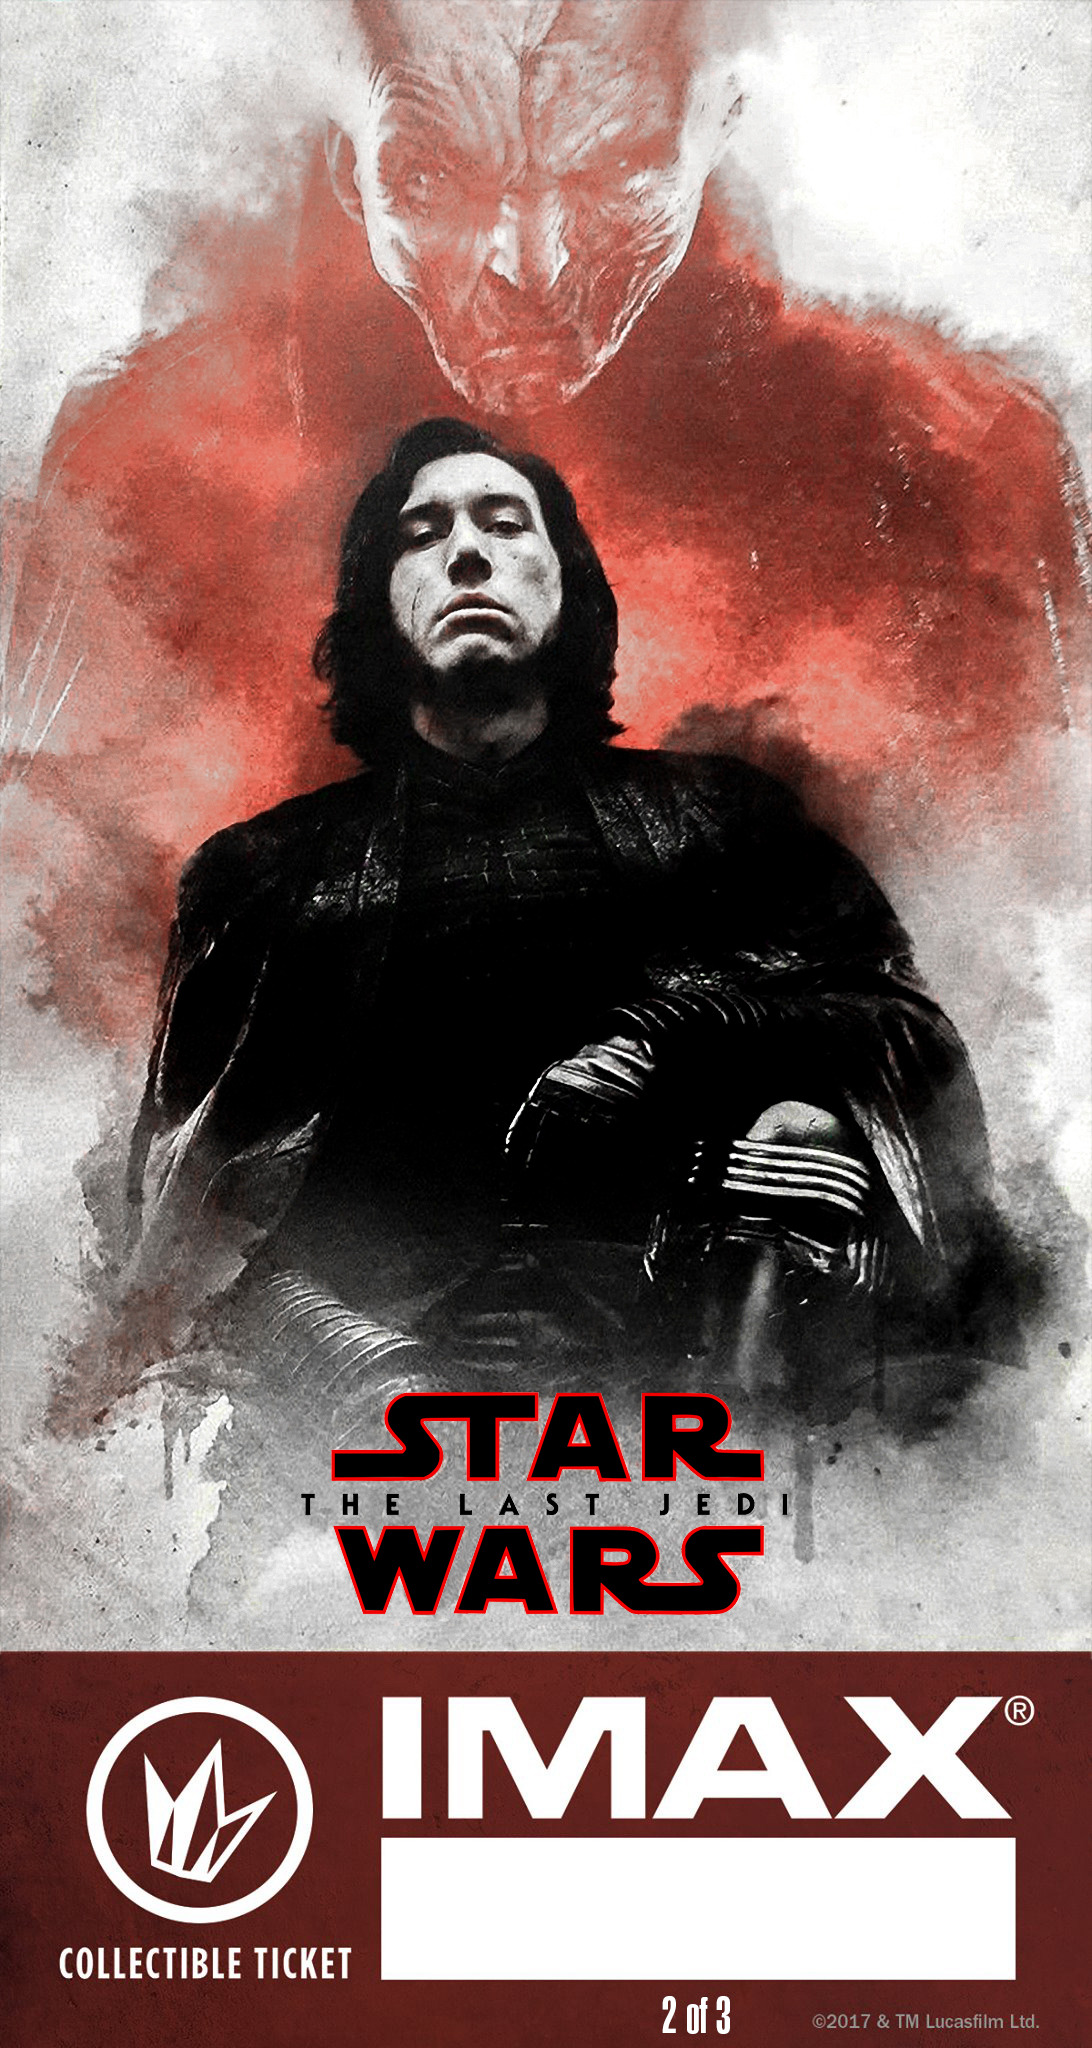 Star Wars The Last Jedi Throne Room Kylo Ren Snoke Praetorian Guard IMAX Poster